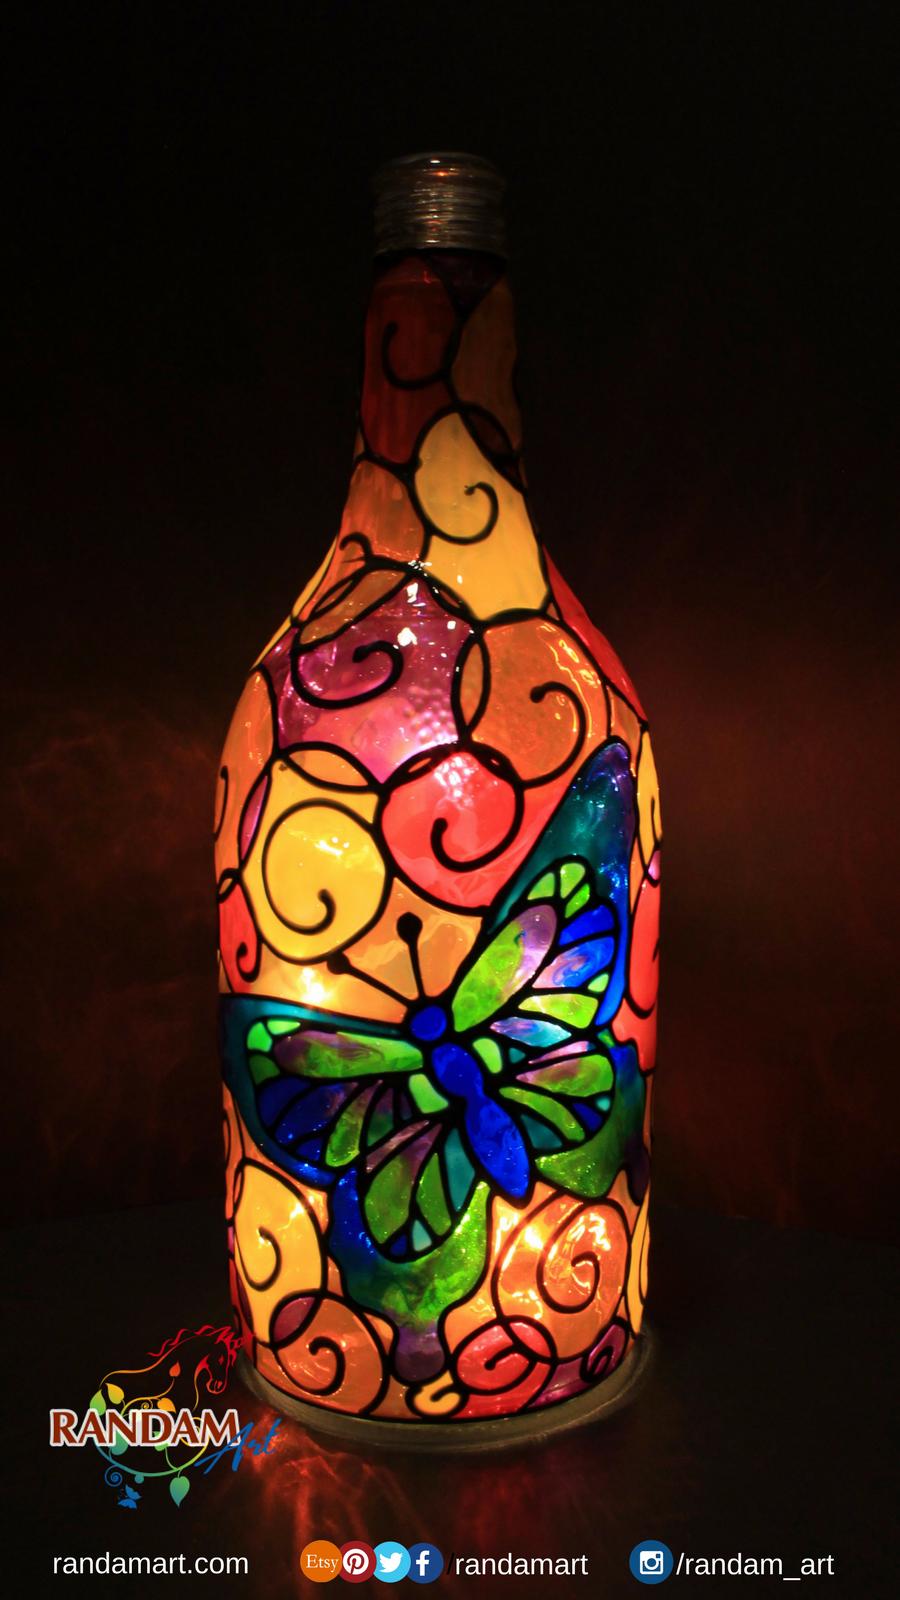 Hand painted bottle light. #Butterfly #BottleLight #Handmade #RandamArt www.randam-art.com